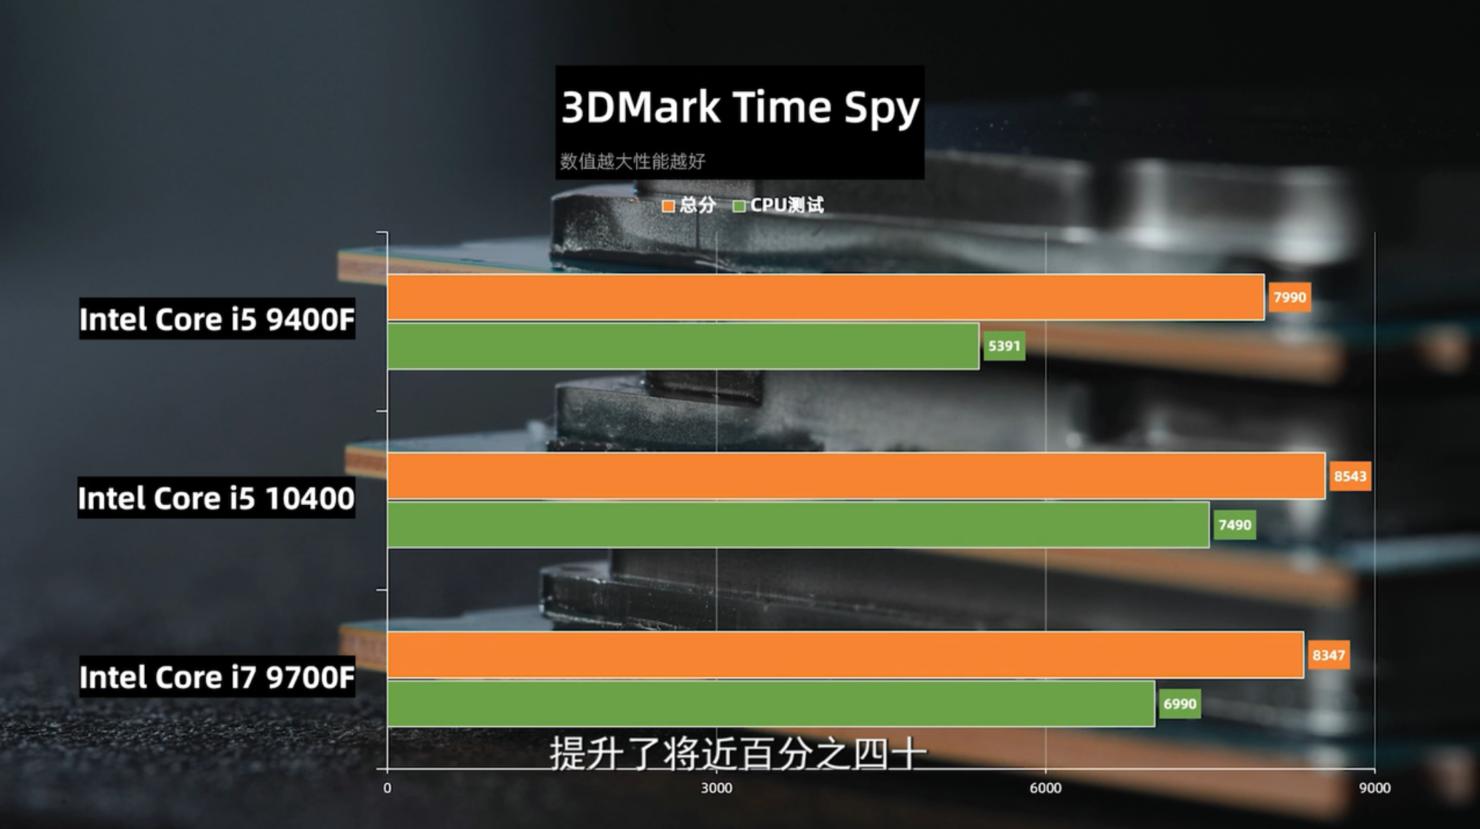 intel-core-i5-10400-comet-lake-s-6-core-desktop-cpu_3dmark-time-spy